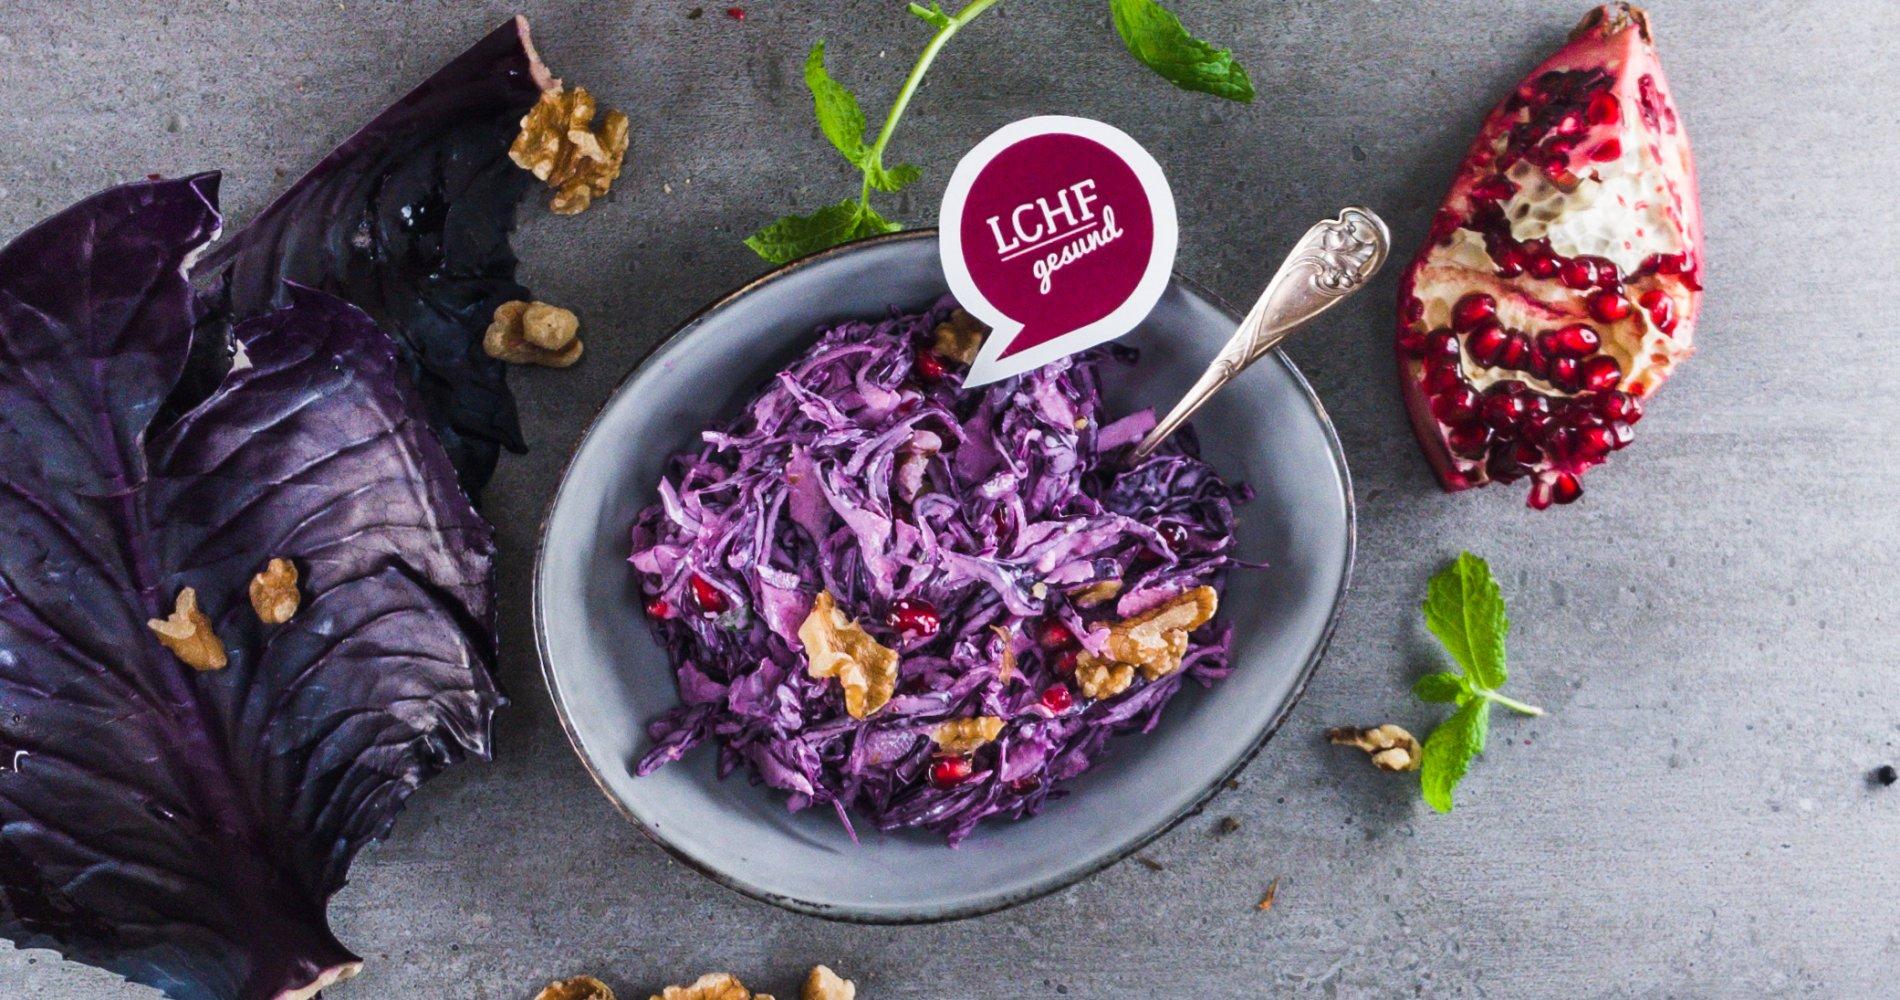 Rezept Low Carb: Rotkohl-Granatapfel-Salat - LCHF-gesund.de